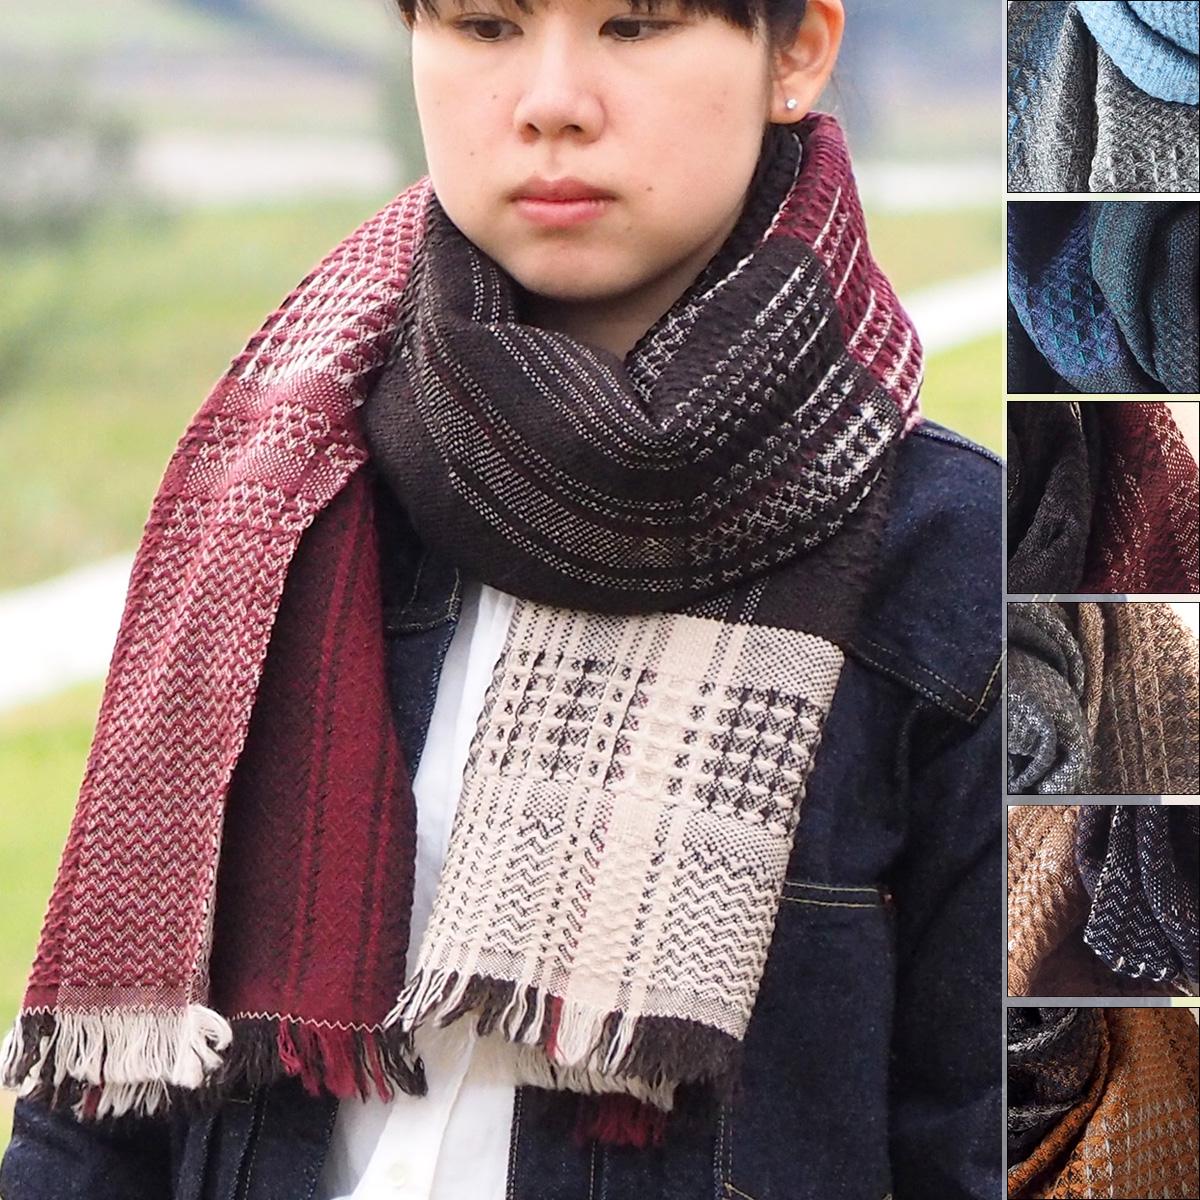 kobooriza−工房織座− ウール100% かわり織りマフラー メンズ・レディース [K-MF-KO01]